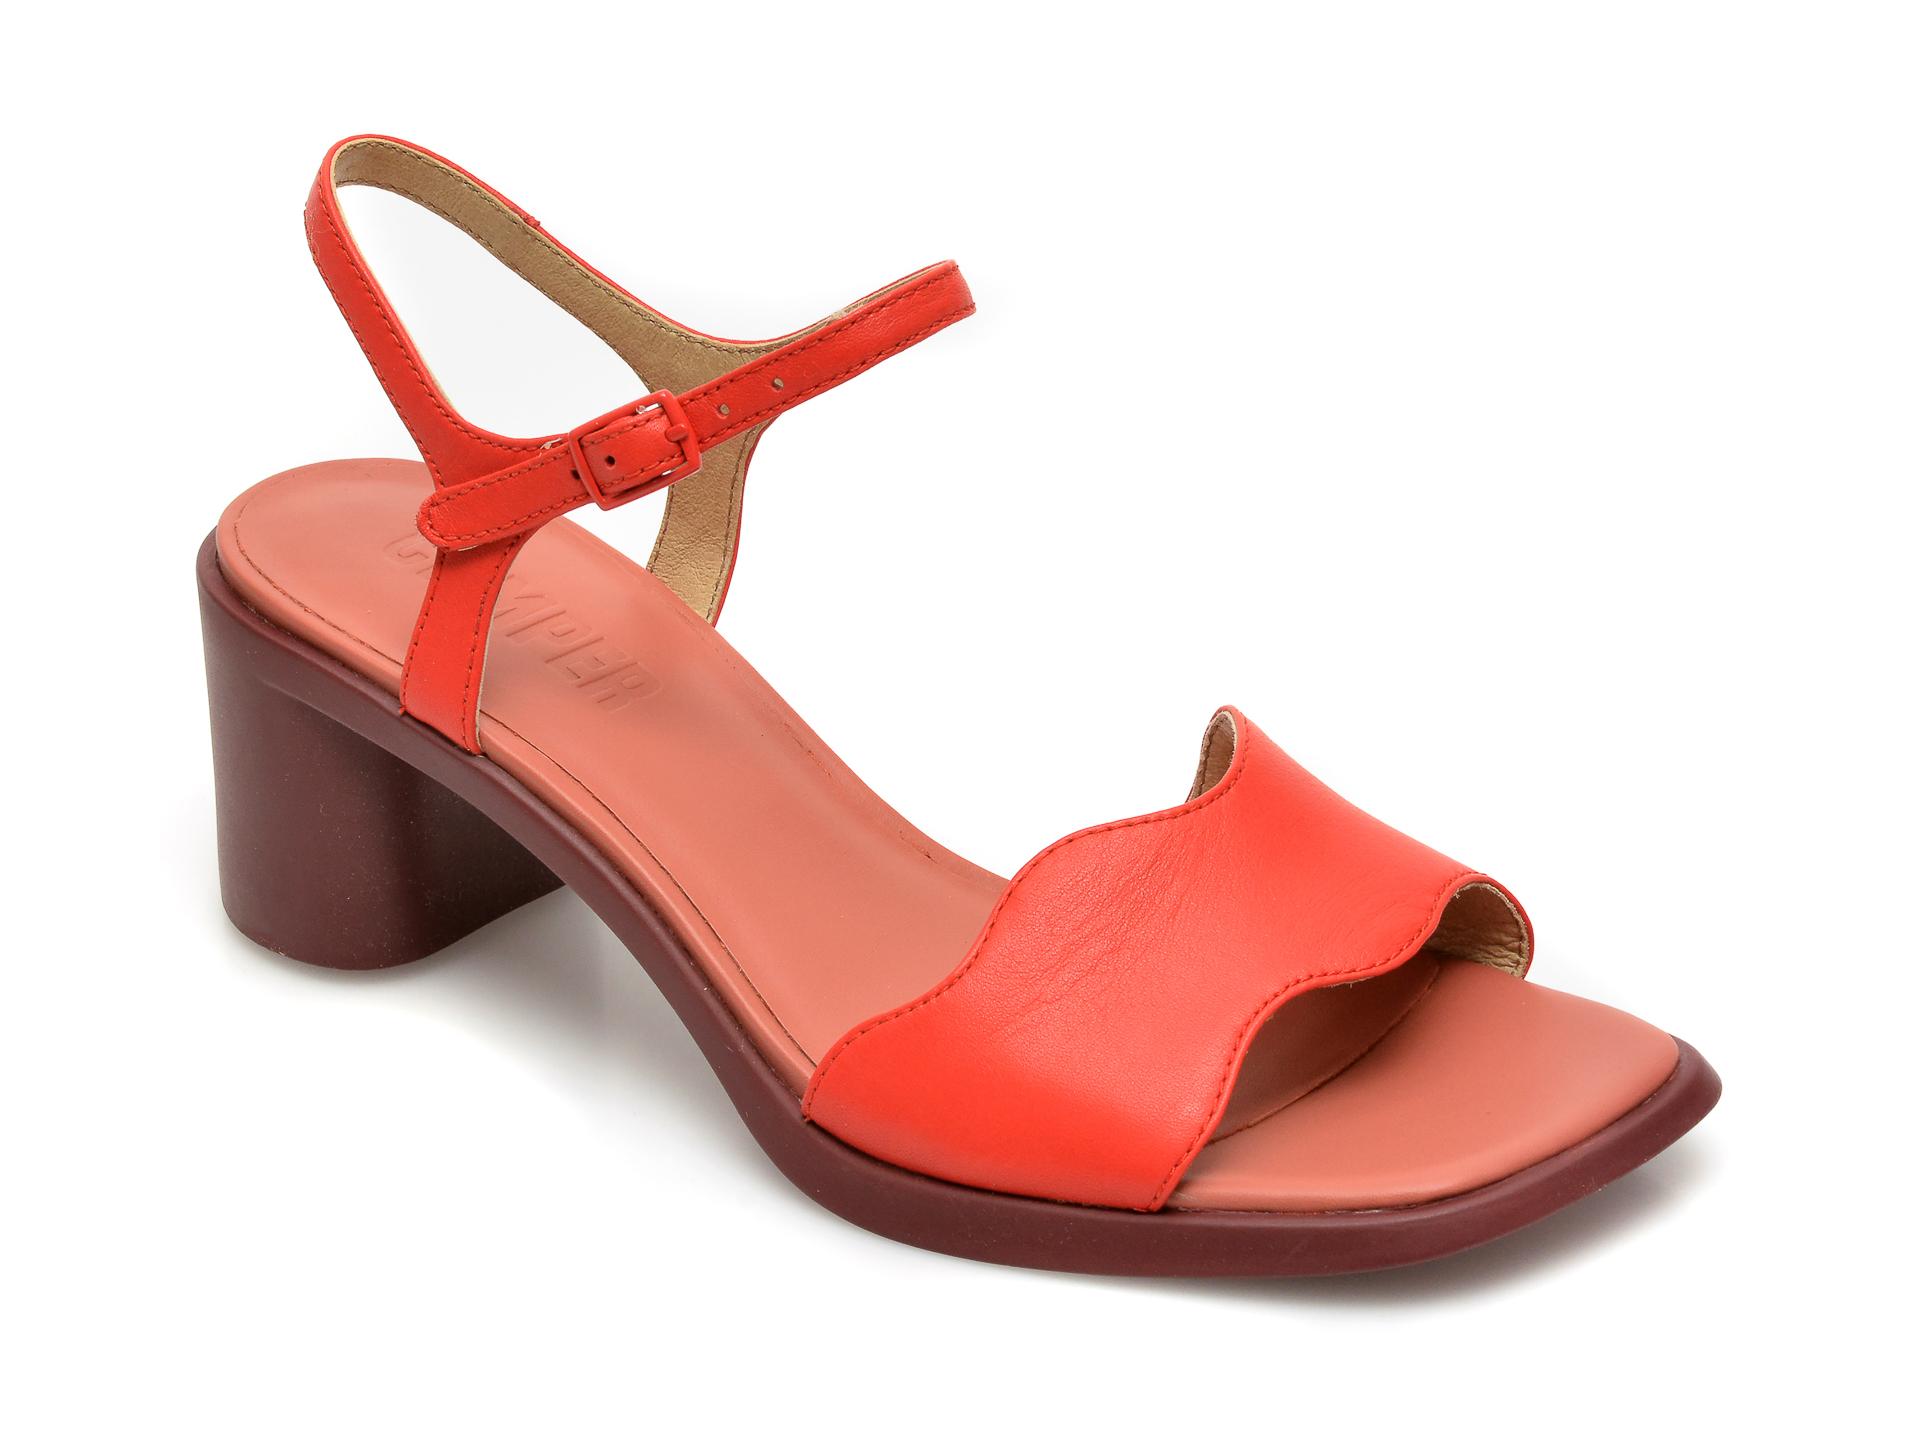 Sandale CAMPER rosii, K201168, din piele naturala imagine otter.ro 2021